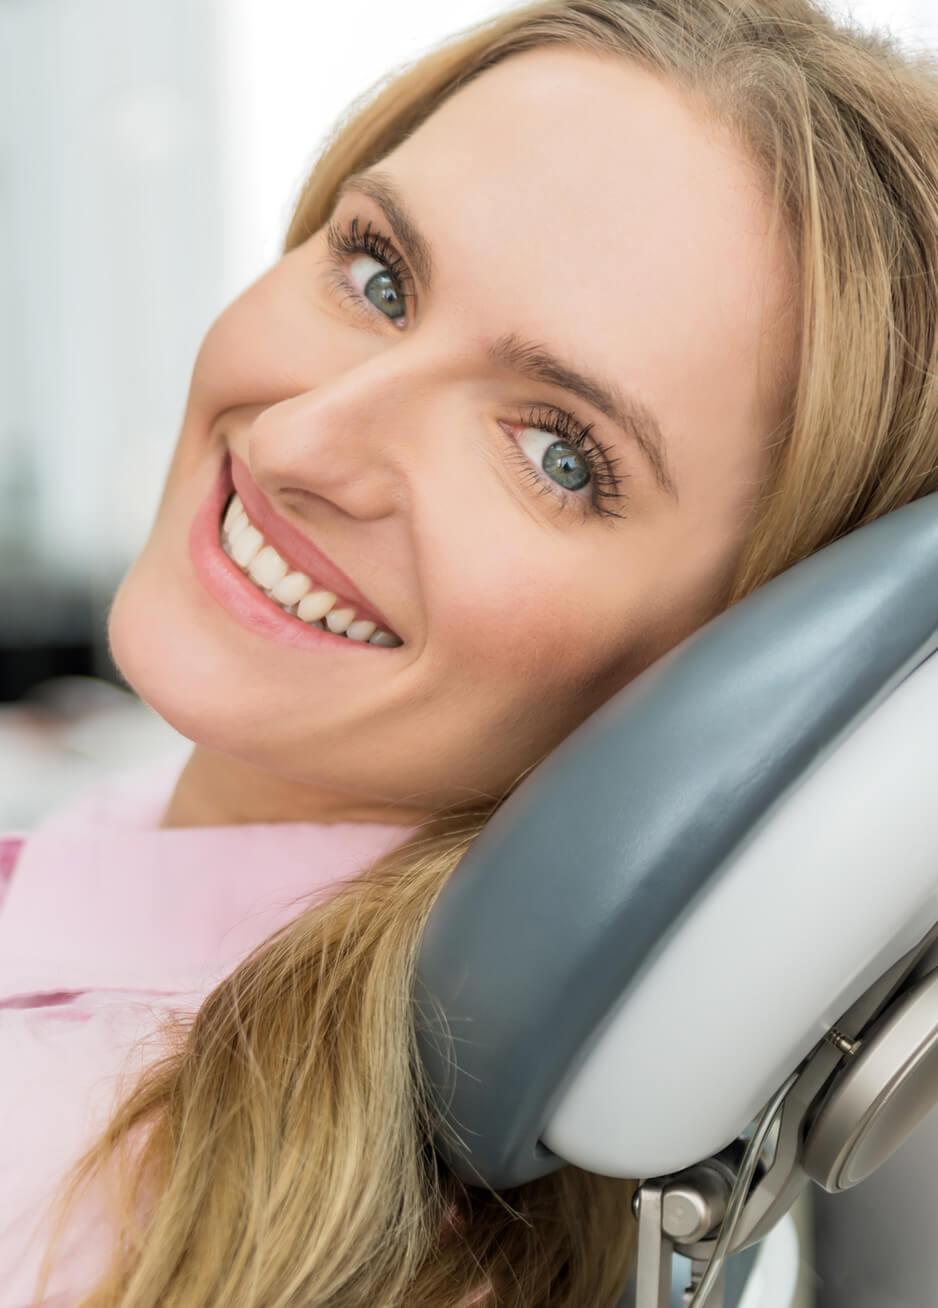 Nitrous Oxide Sedation Dentistry Fitchburg WI - Mendota Springs Dentistry